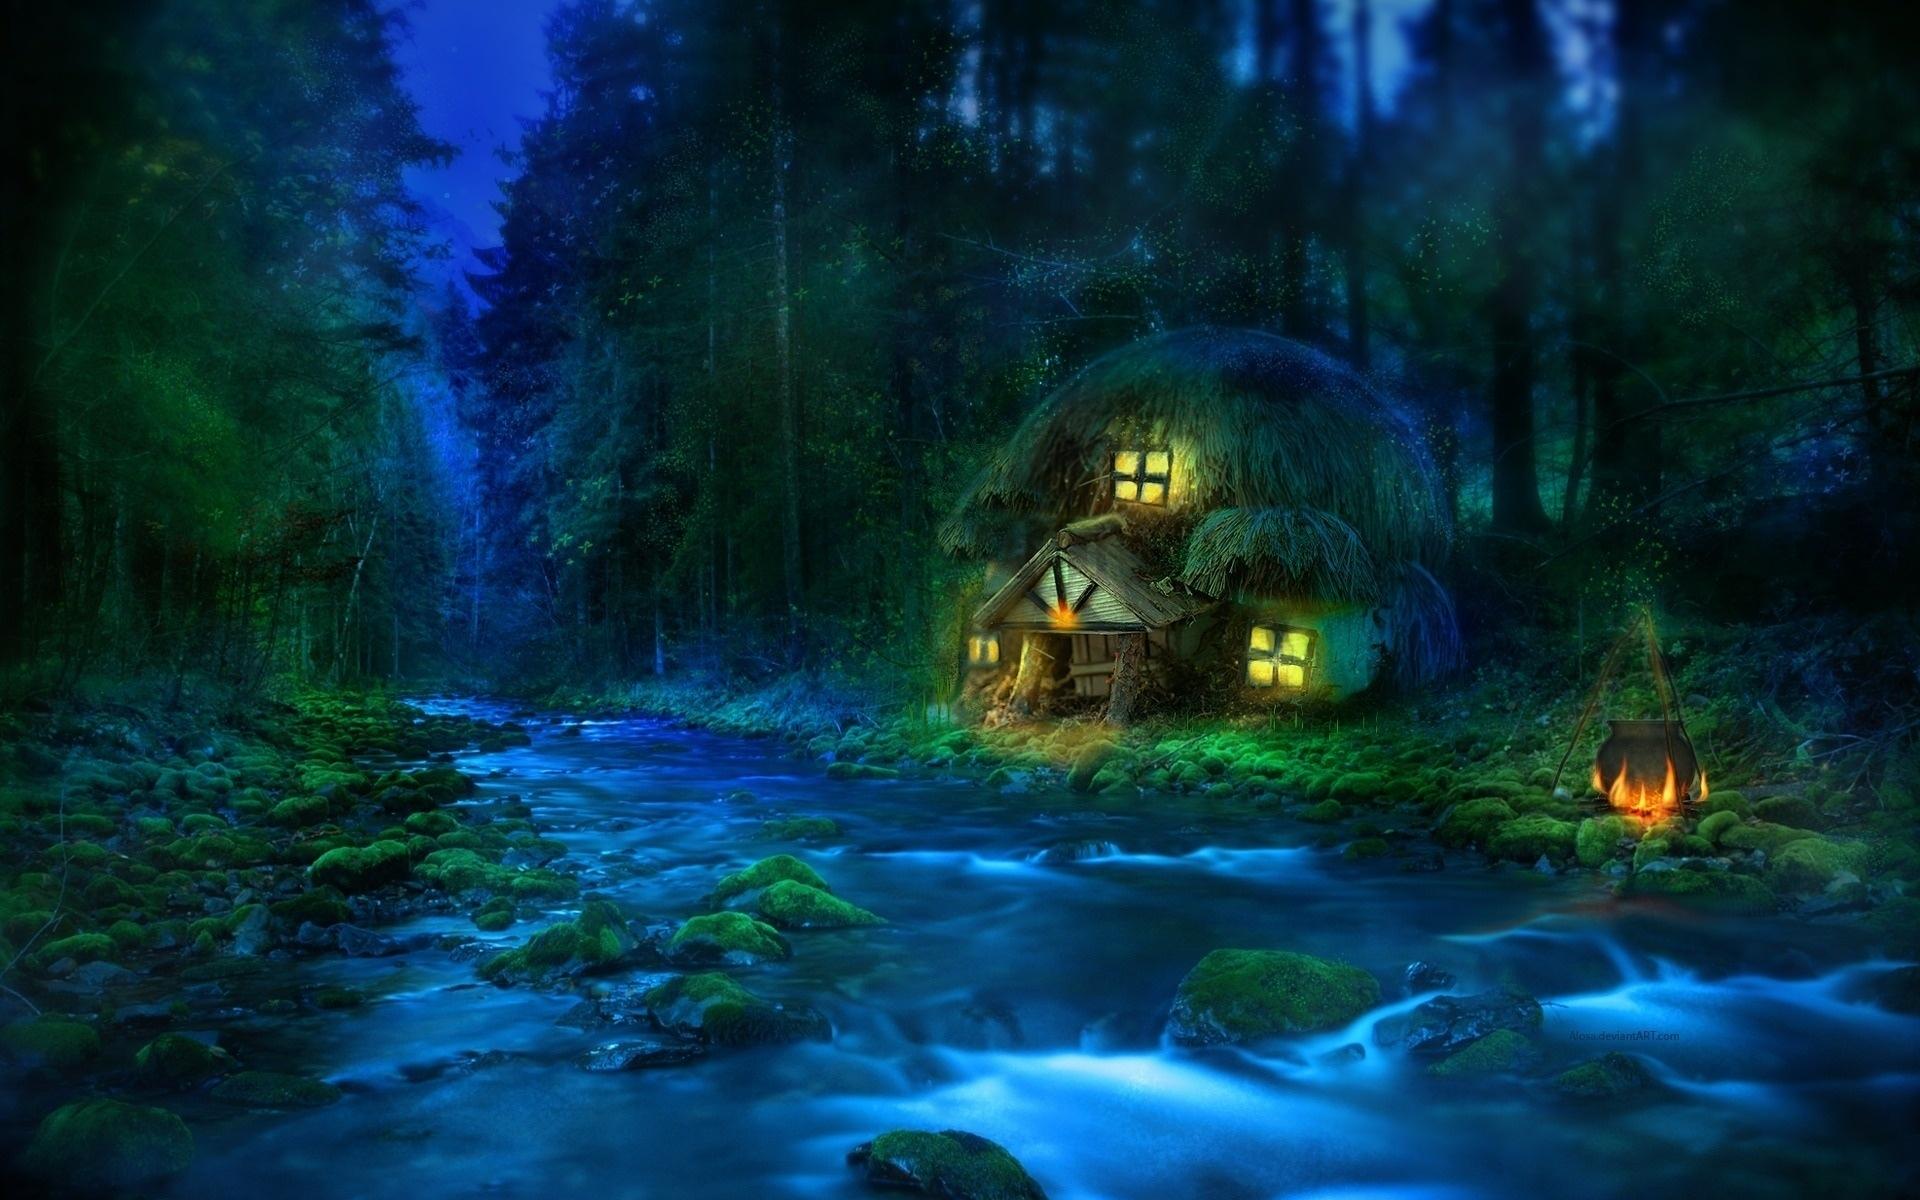 fantasy world: